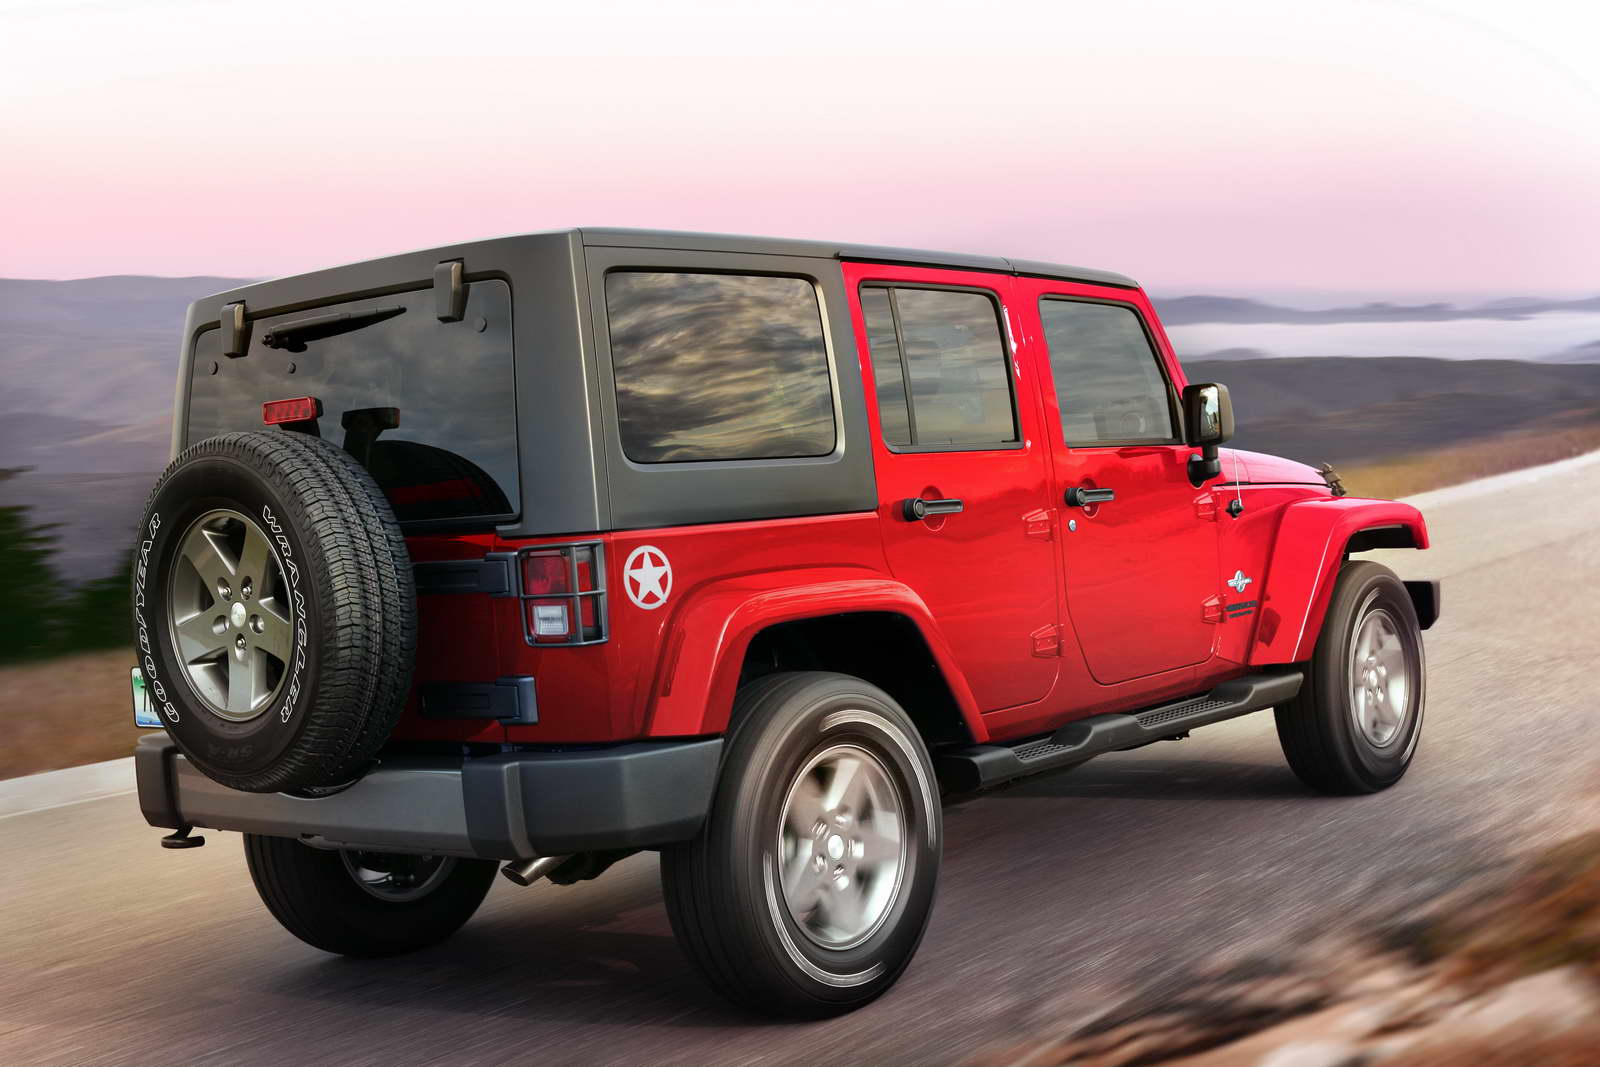 2018 jeep wrangler to get 8-speed auto, aluminum body likely